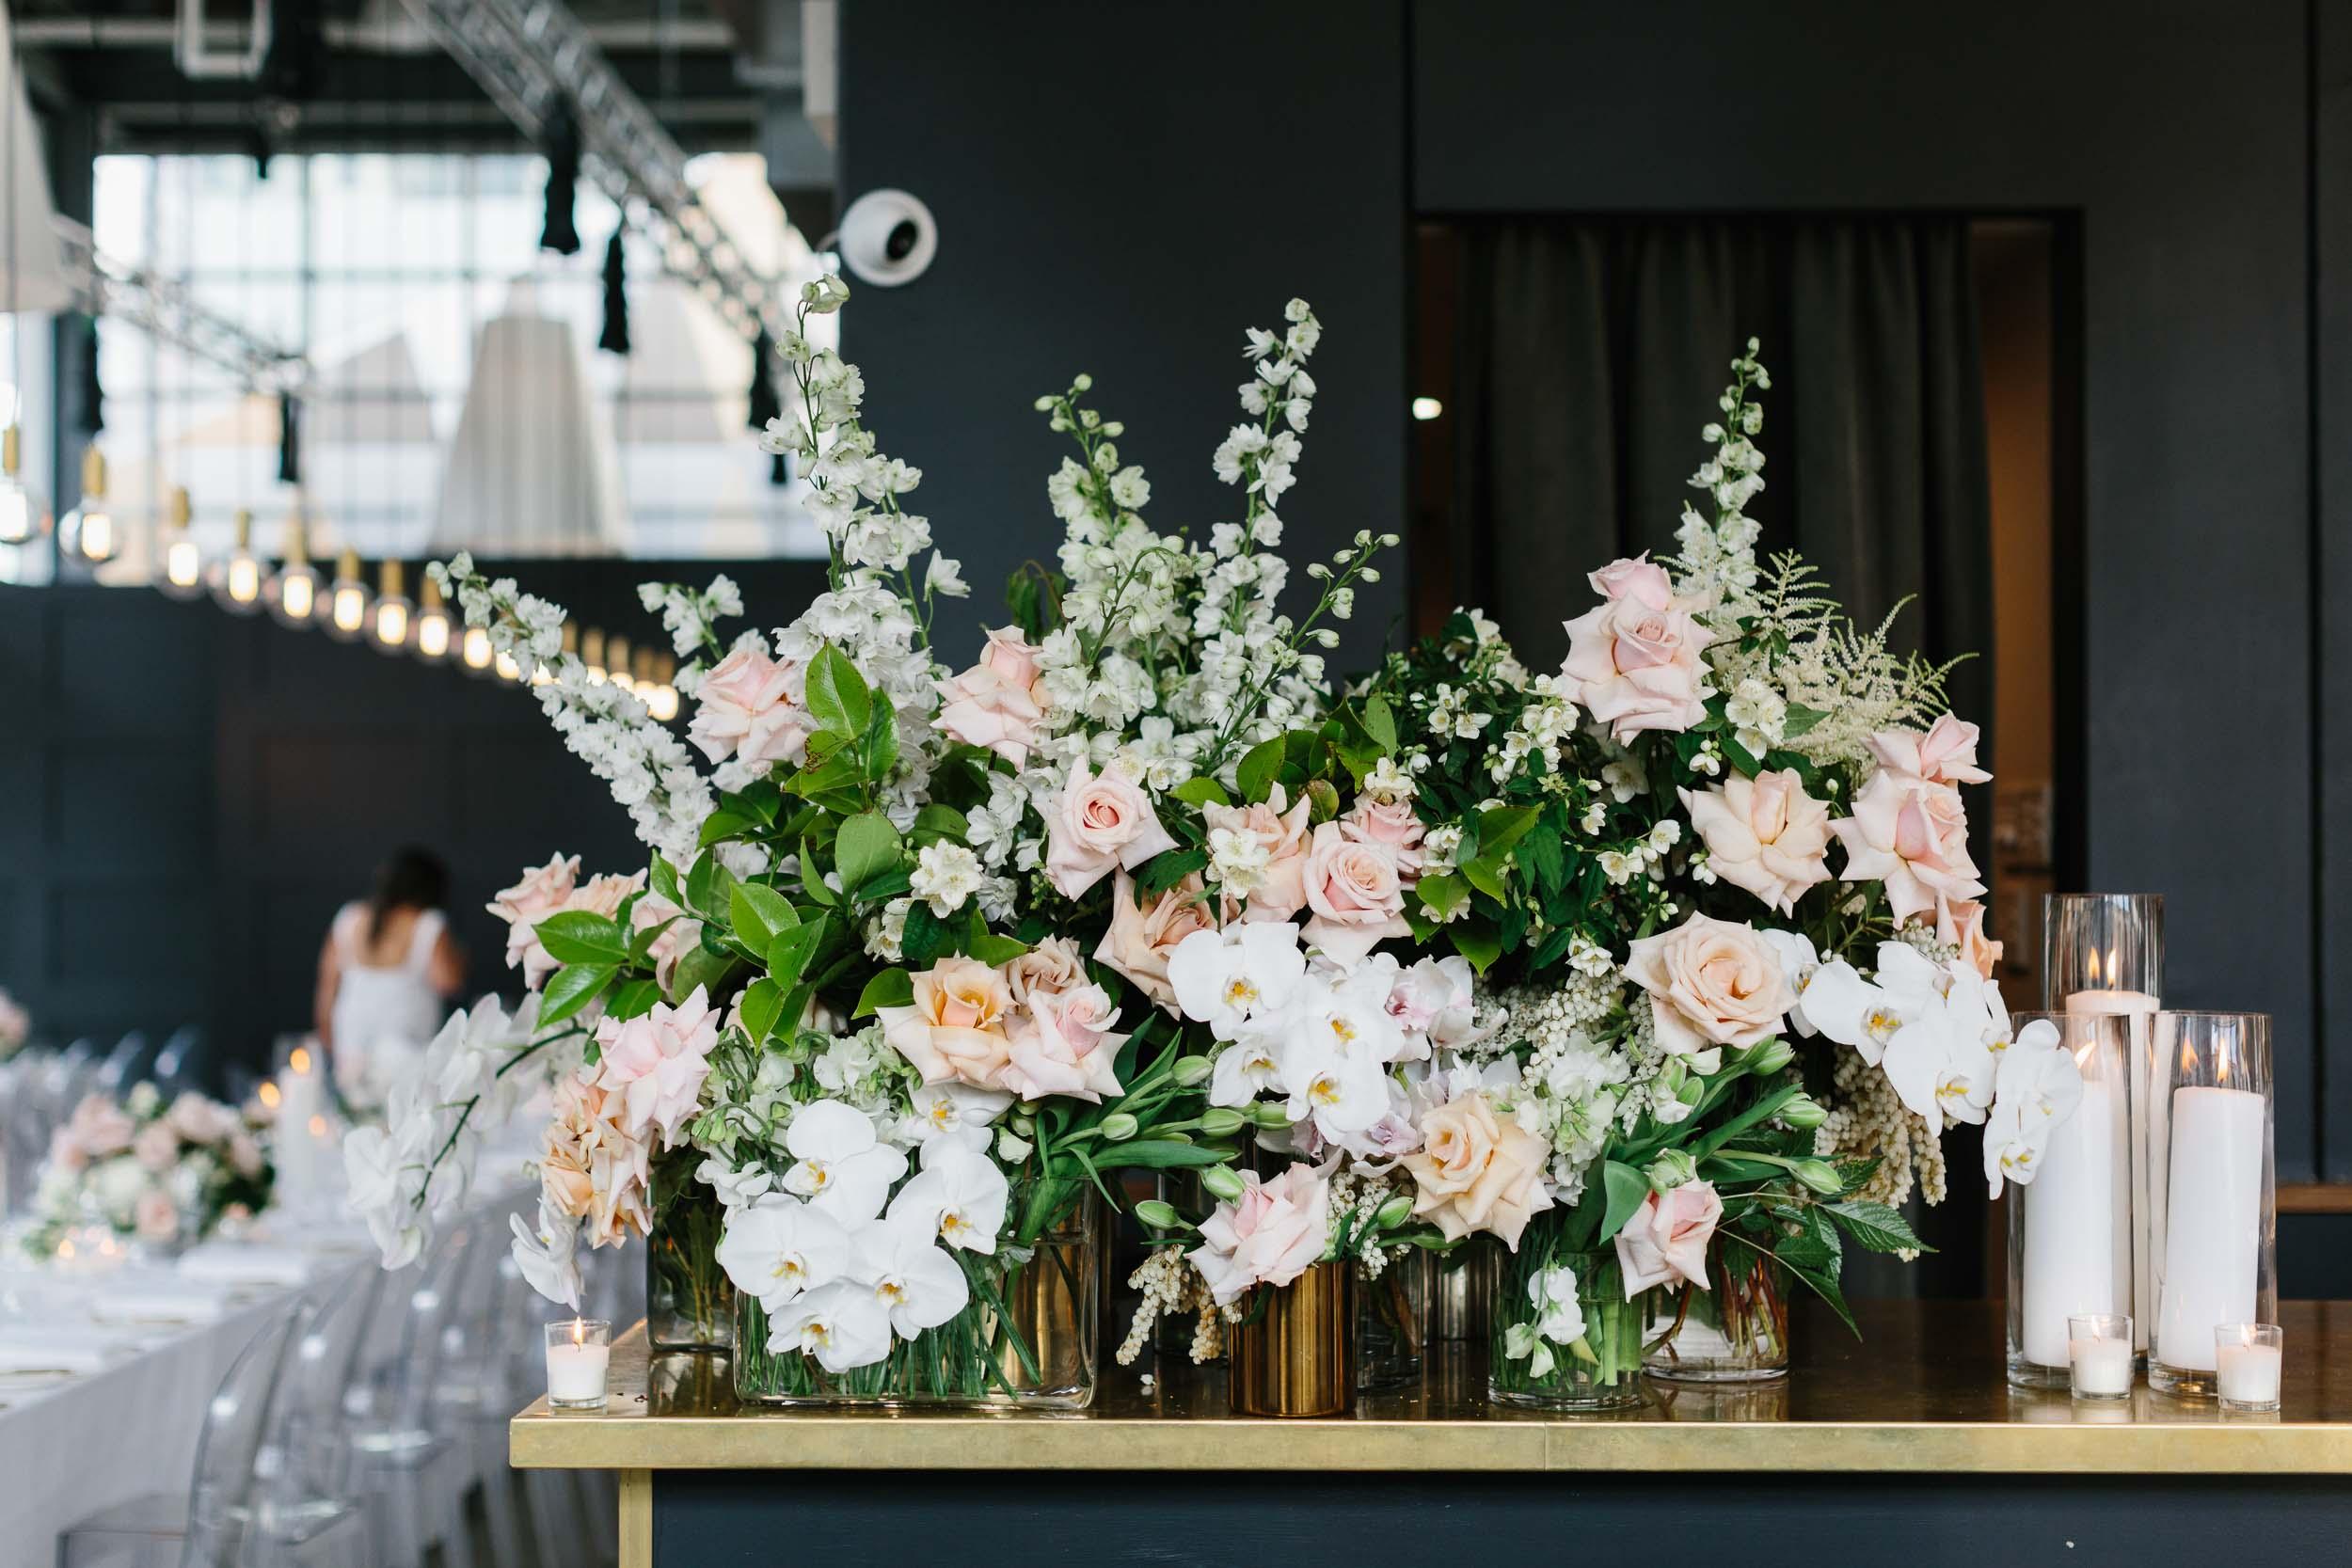 Kas-Richards-Wedding-Photographer-Melbourne-City-Wedding-Alto-Event-Space-Jane-Hill-Bridal-Gown-41.jpg